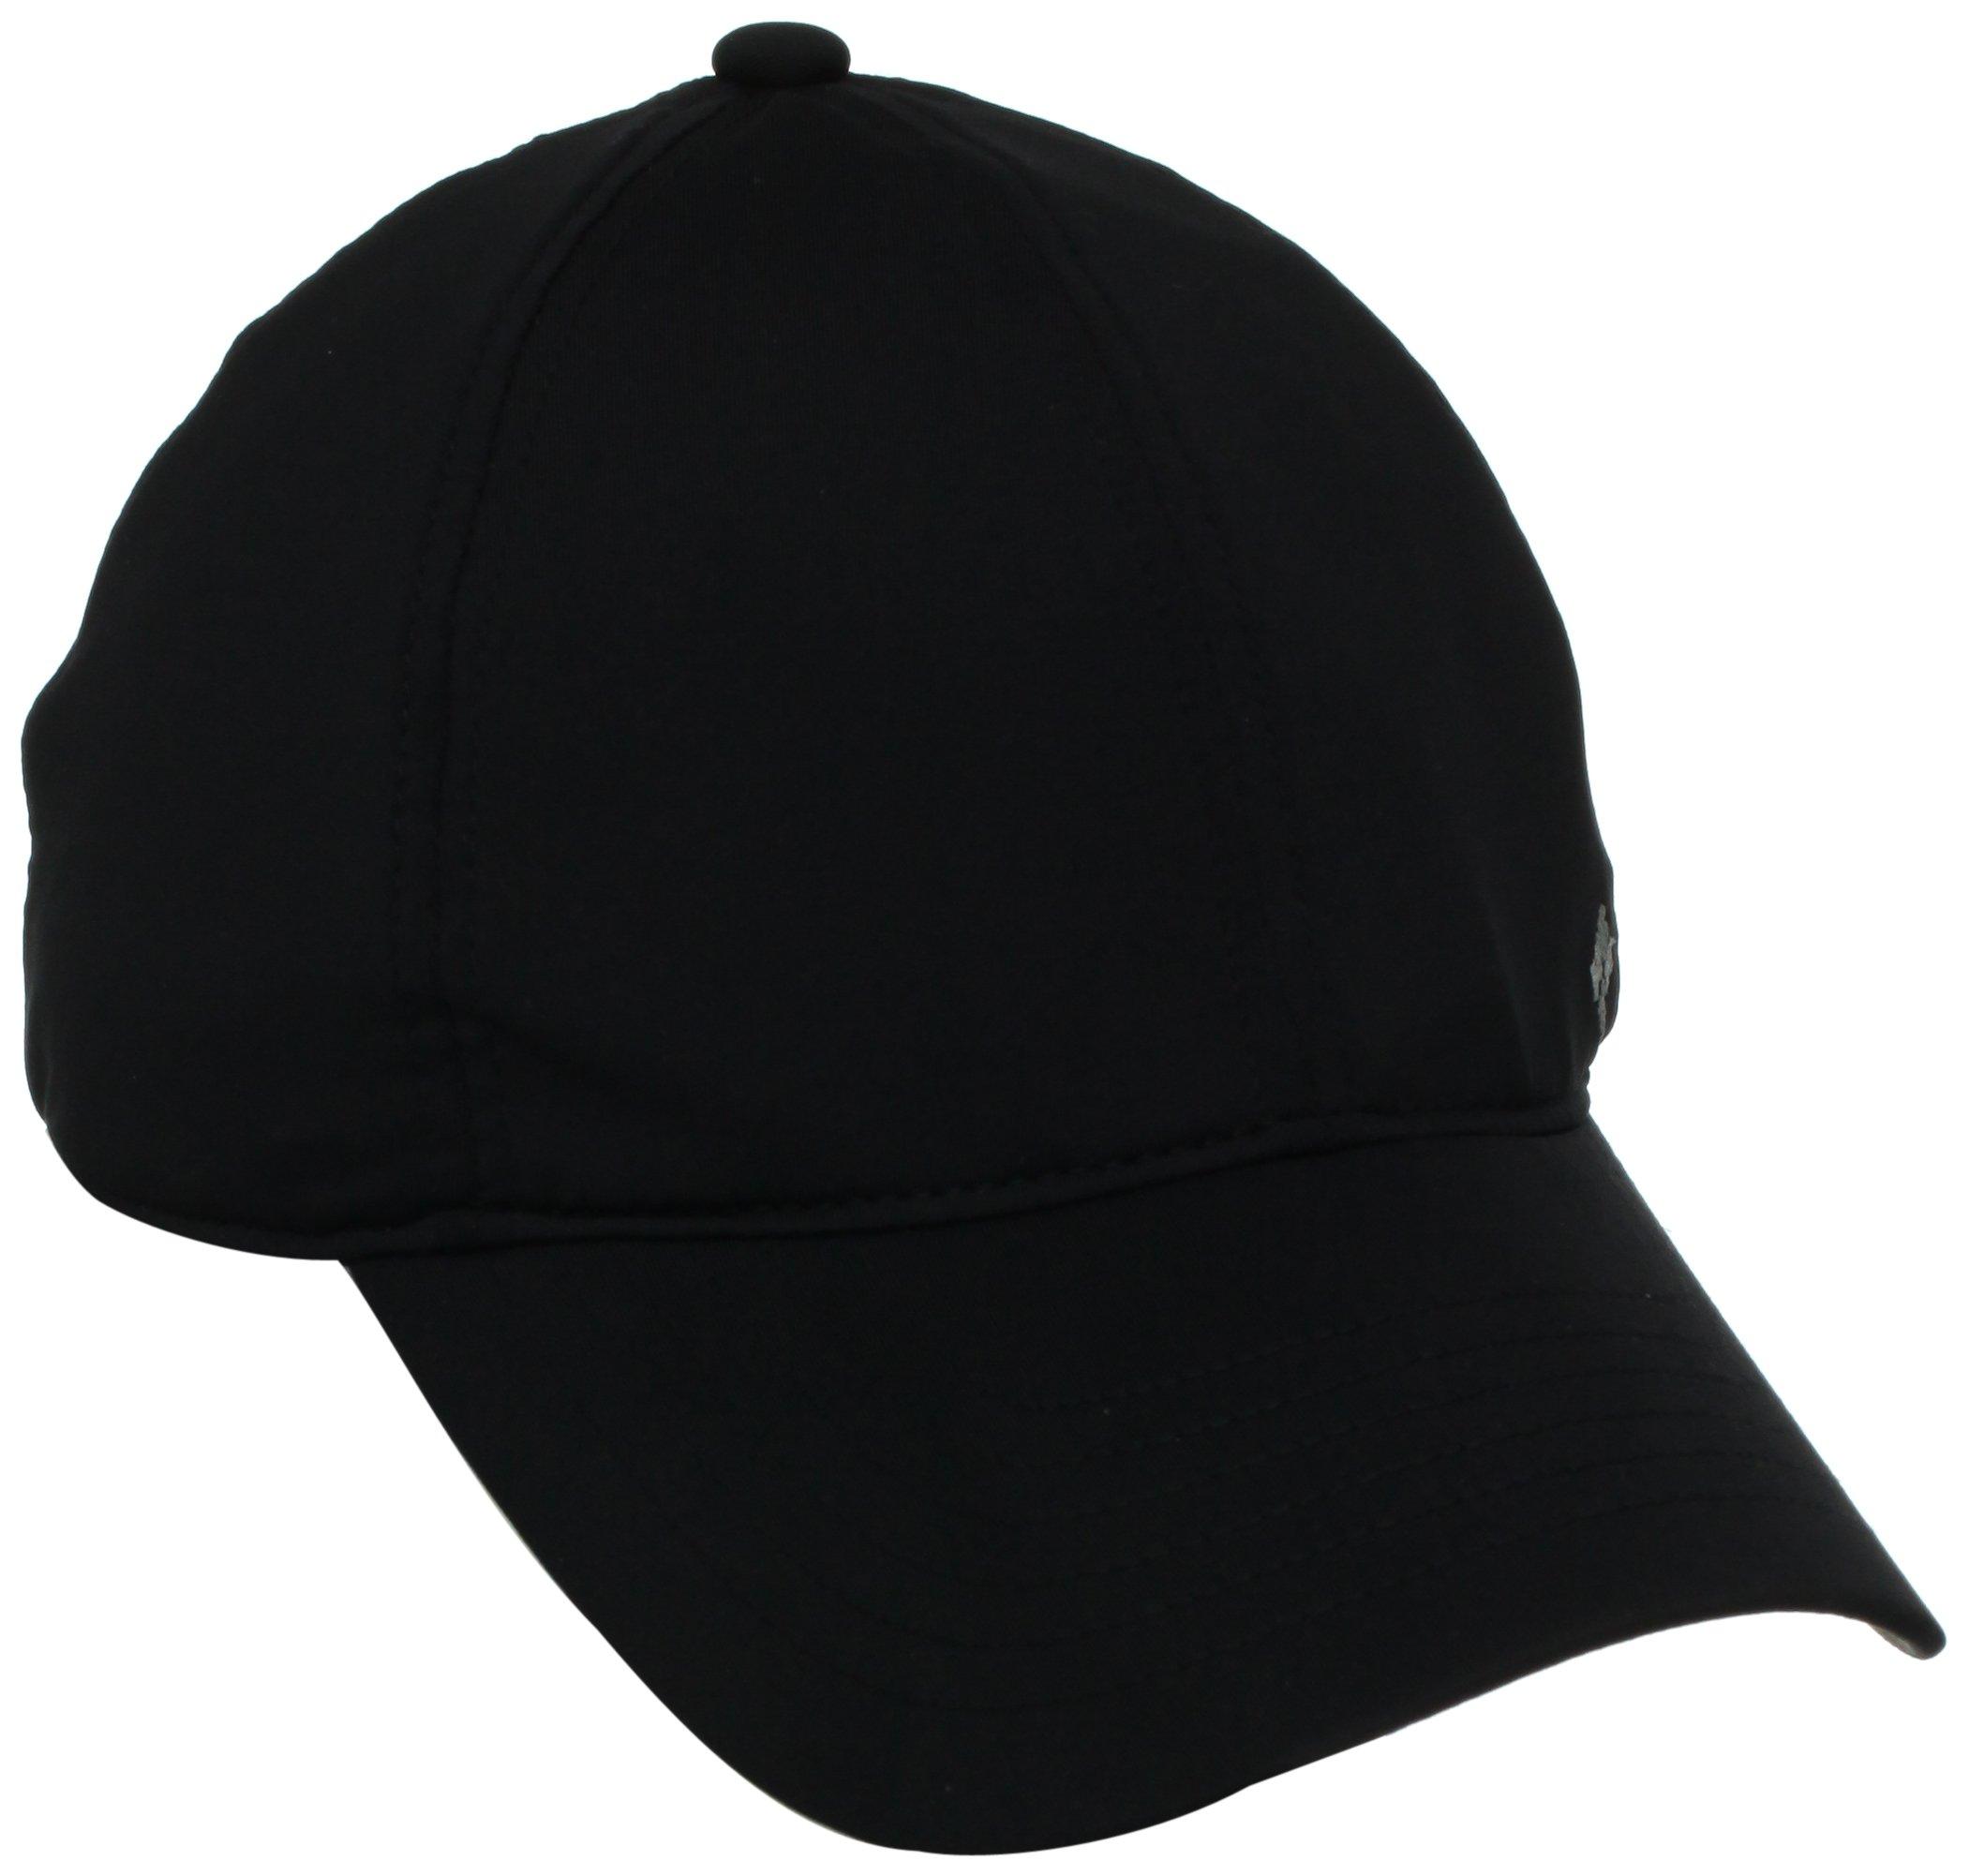 Columbia Women's Coolhead Ball Cap III, Black, One Size